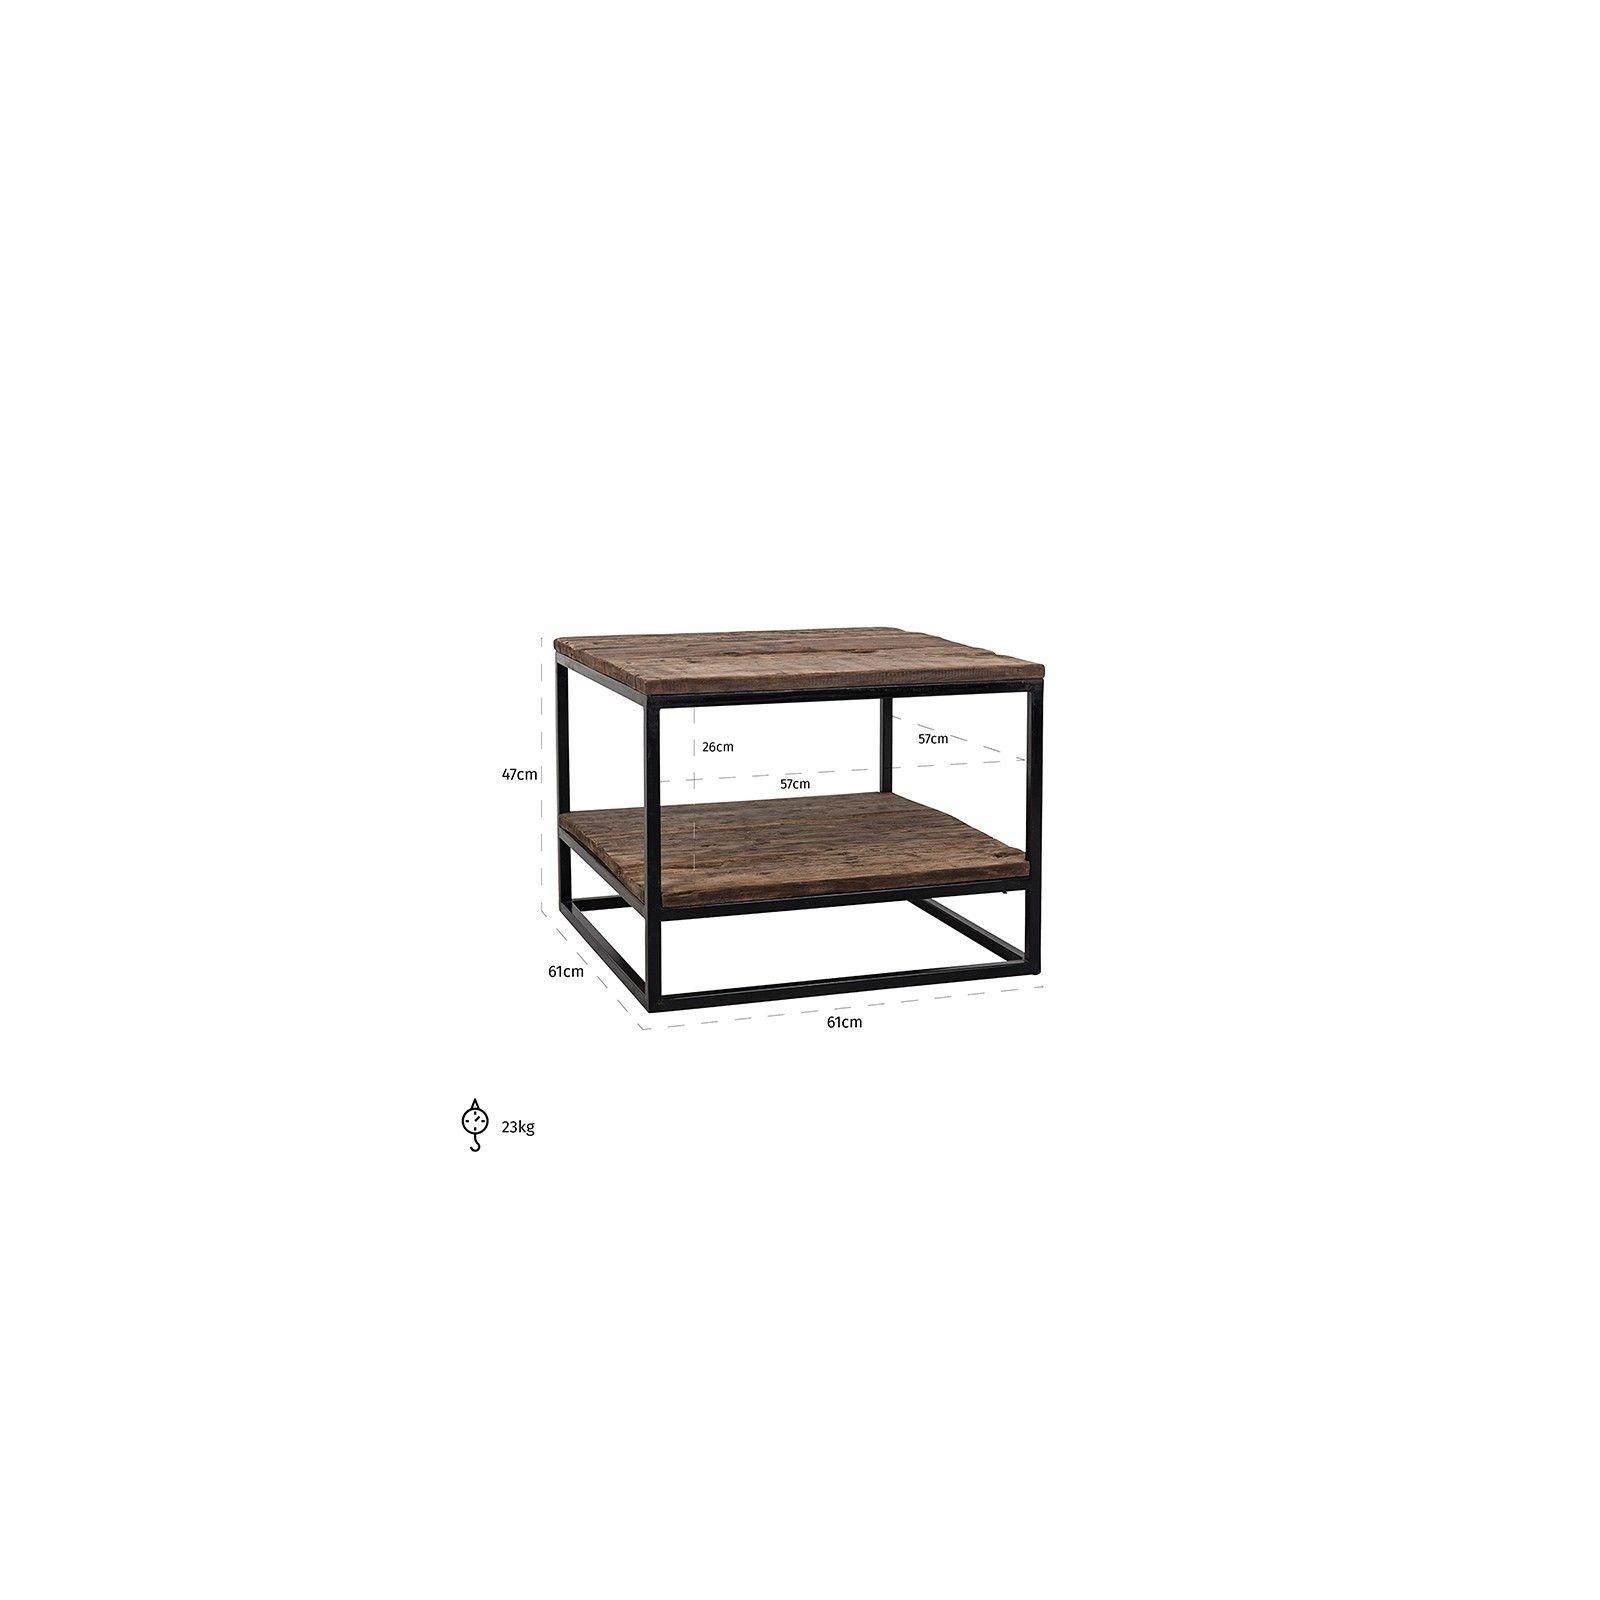 Table d'angle Raffles, Recyceld wood Meuble Déco Tendance - 190